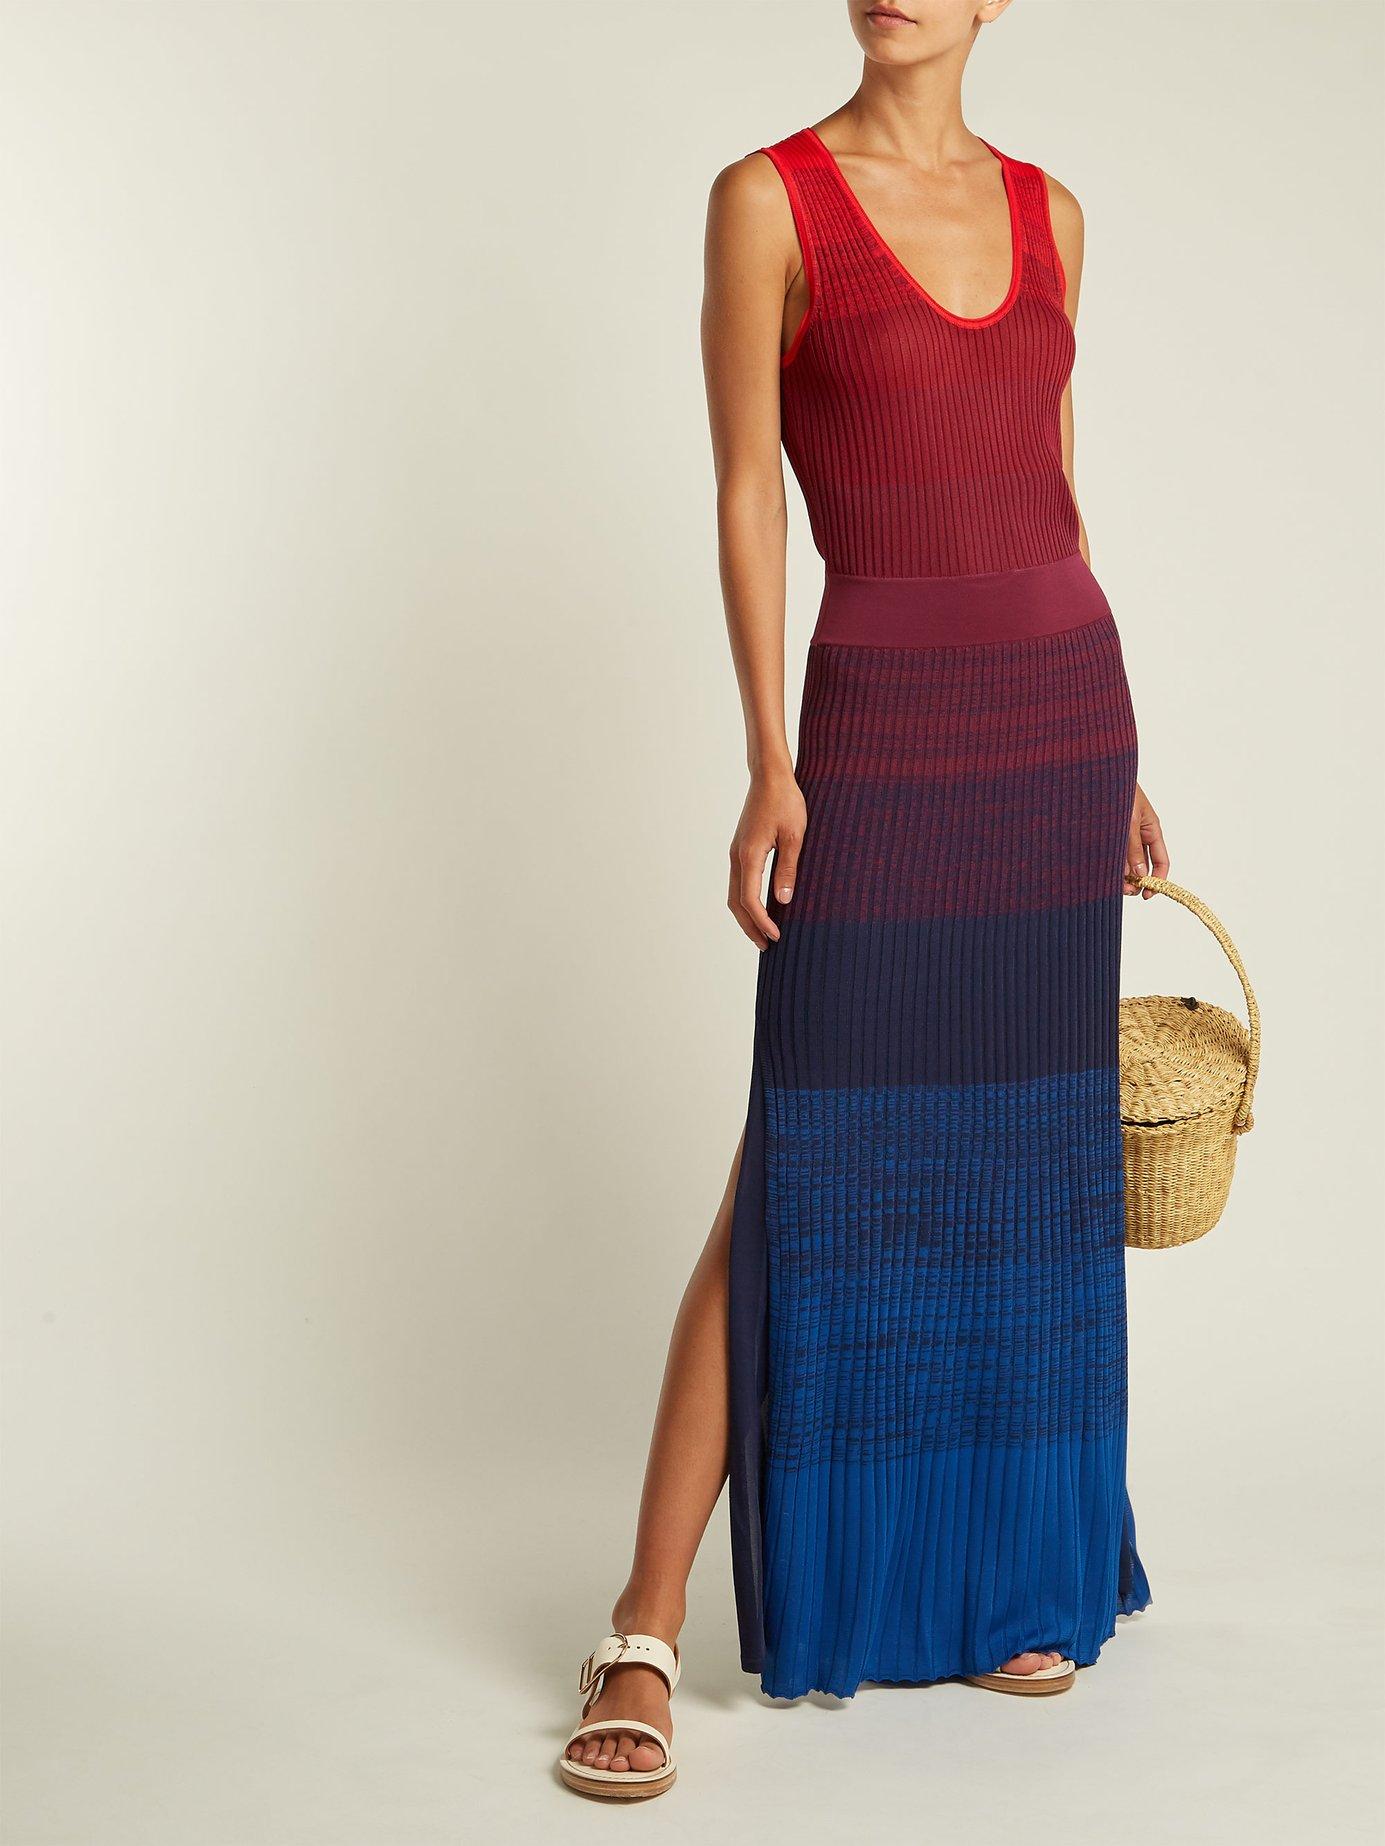 Winona ribbed-knit maxi dress by Elizabeth And James